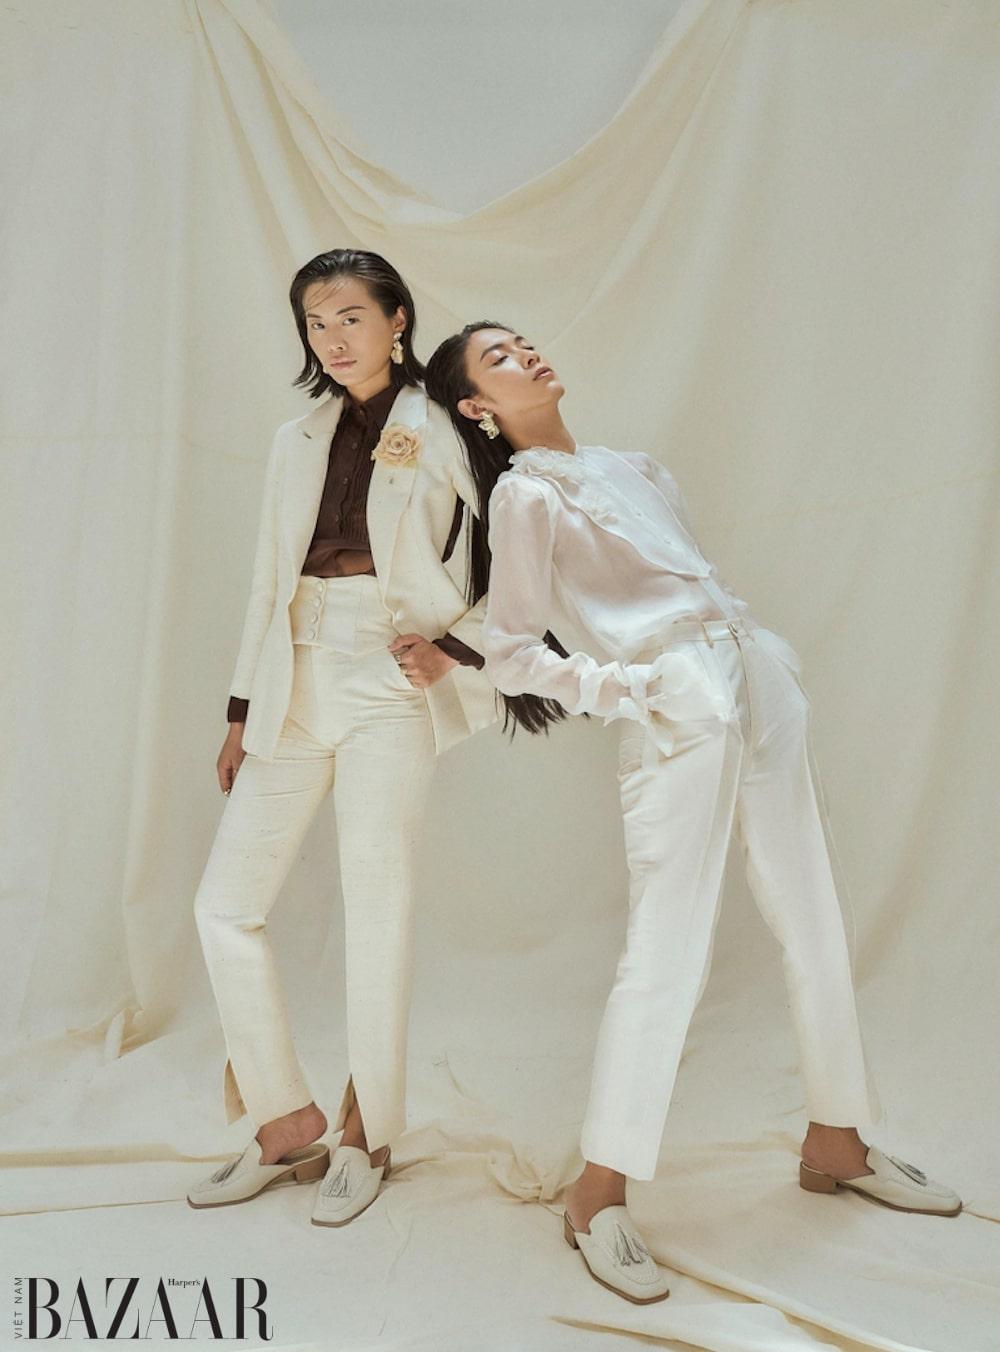 Fashion Creation 2020: Lê Triệu Duy Anh